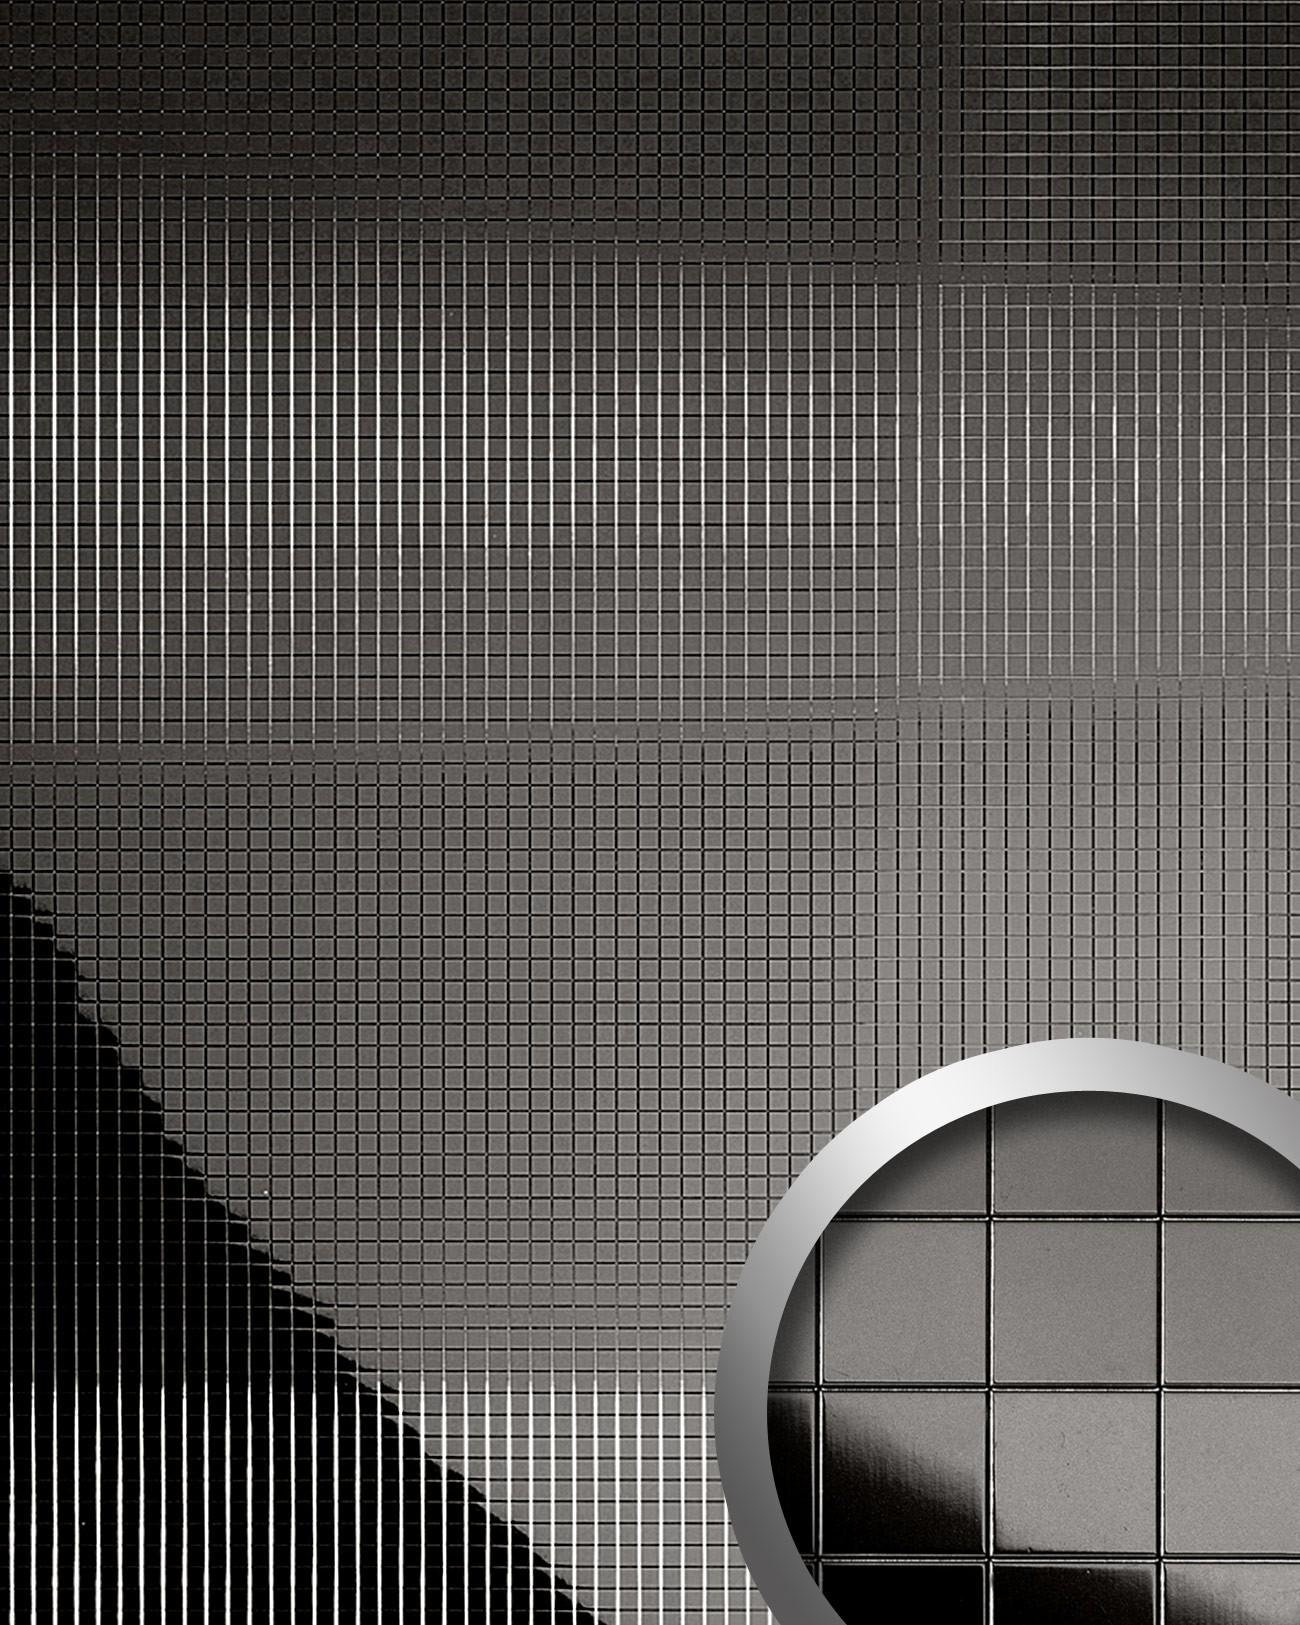 wandpaneel wandverkleidung wallface 10533 m style design metall mosaik dekor selbstklebend. Black Bedroom Furniture Sets. Home Design Ideas